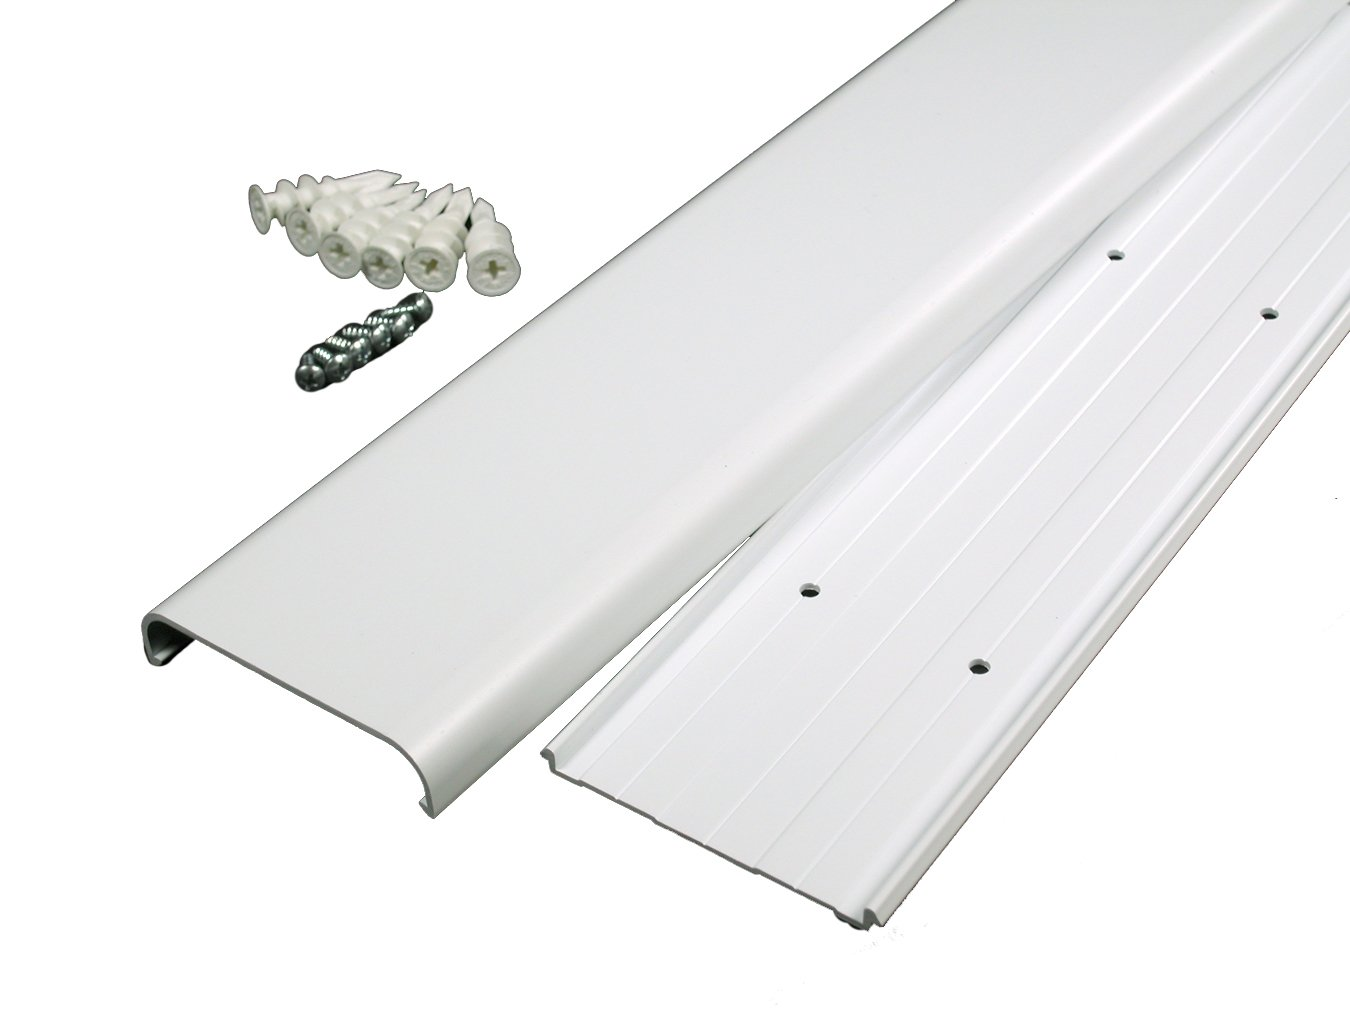 Legrand - Wiremold C30 Flat Screen TV Cord Cover, White